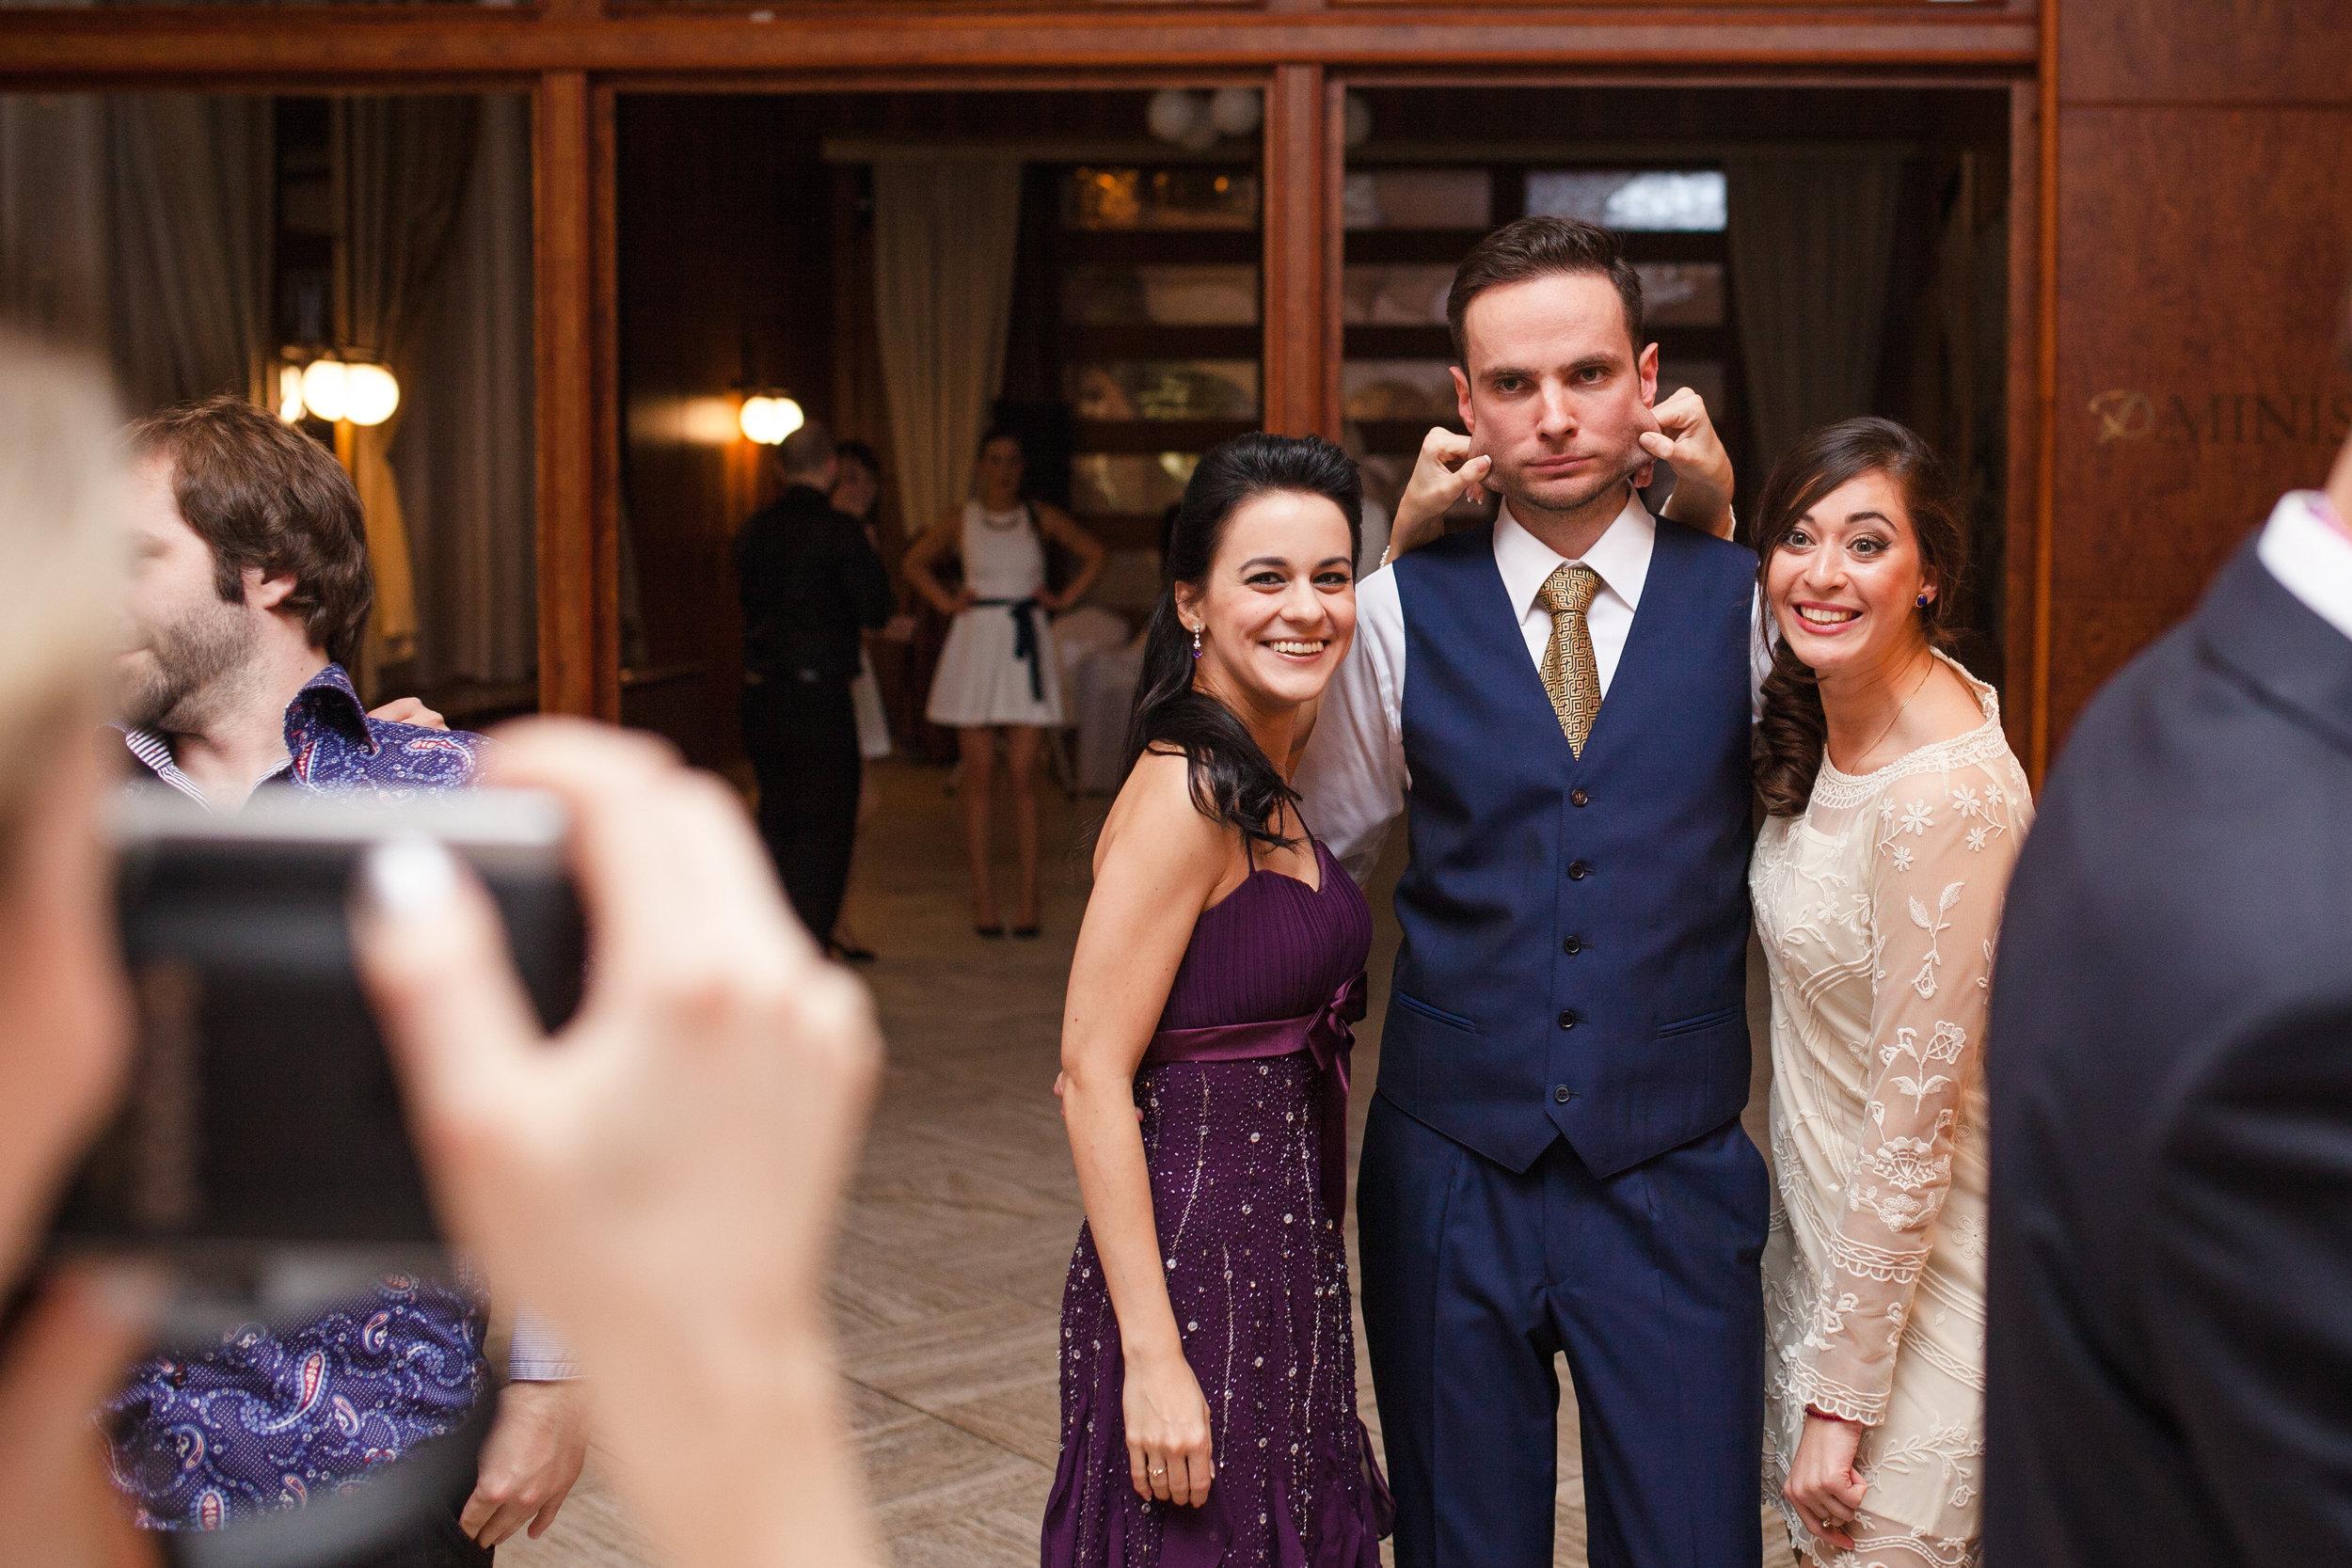 destination-wedding-photographer-slovakia-bratislava-reception-guests-fun-groom.jpg